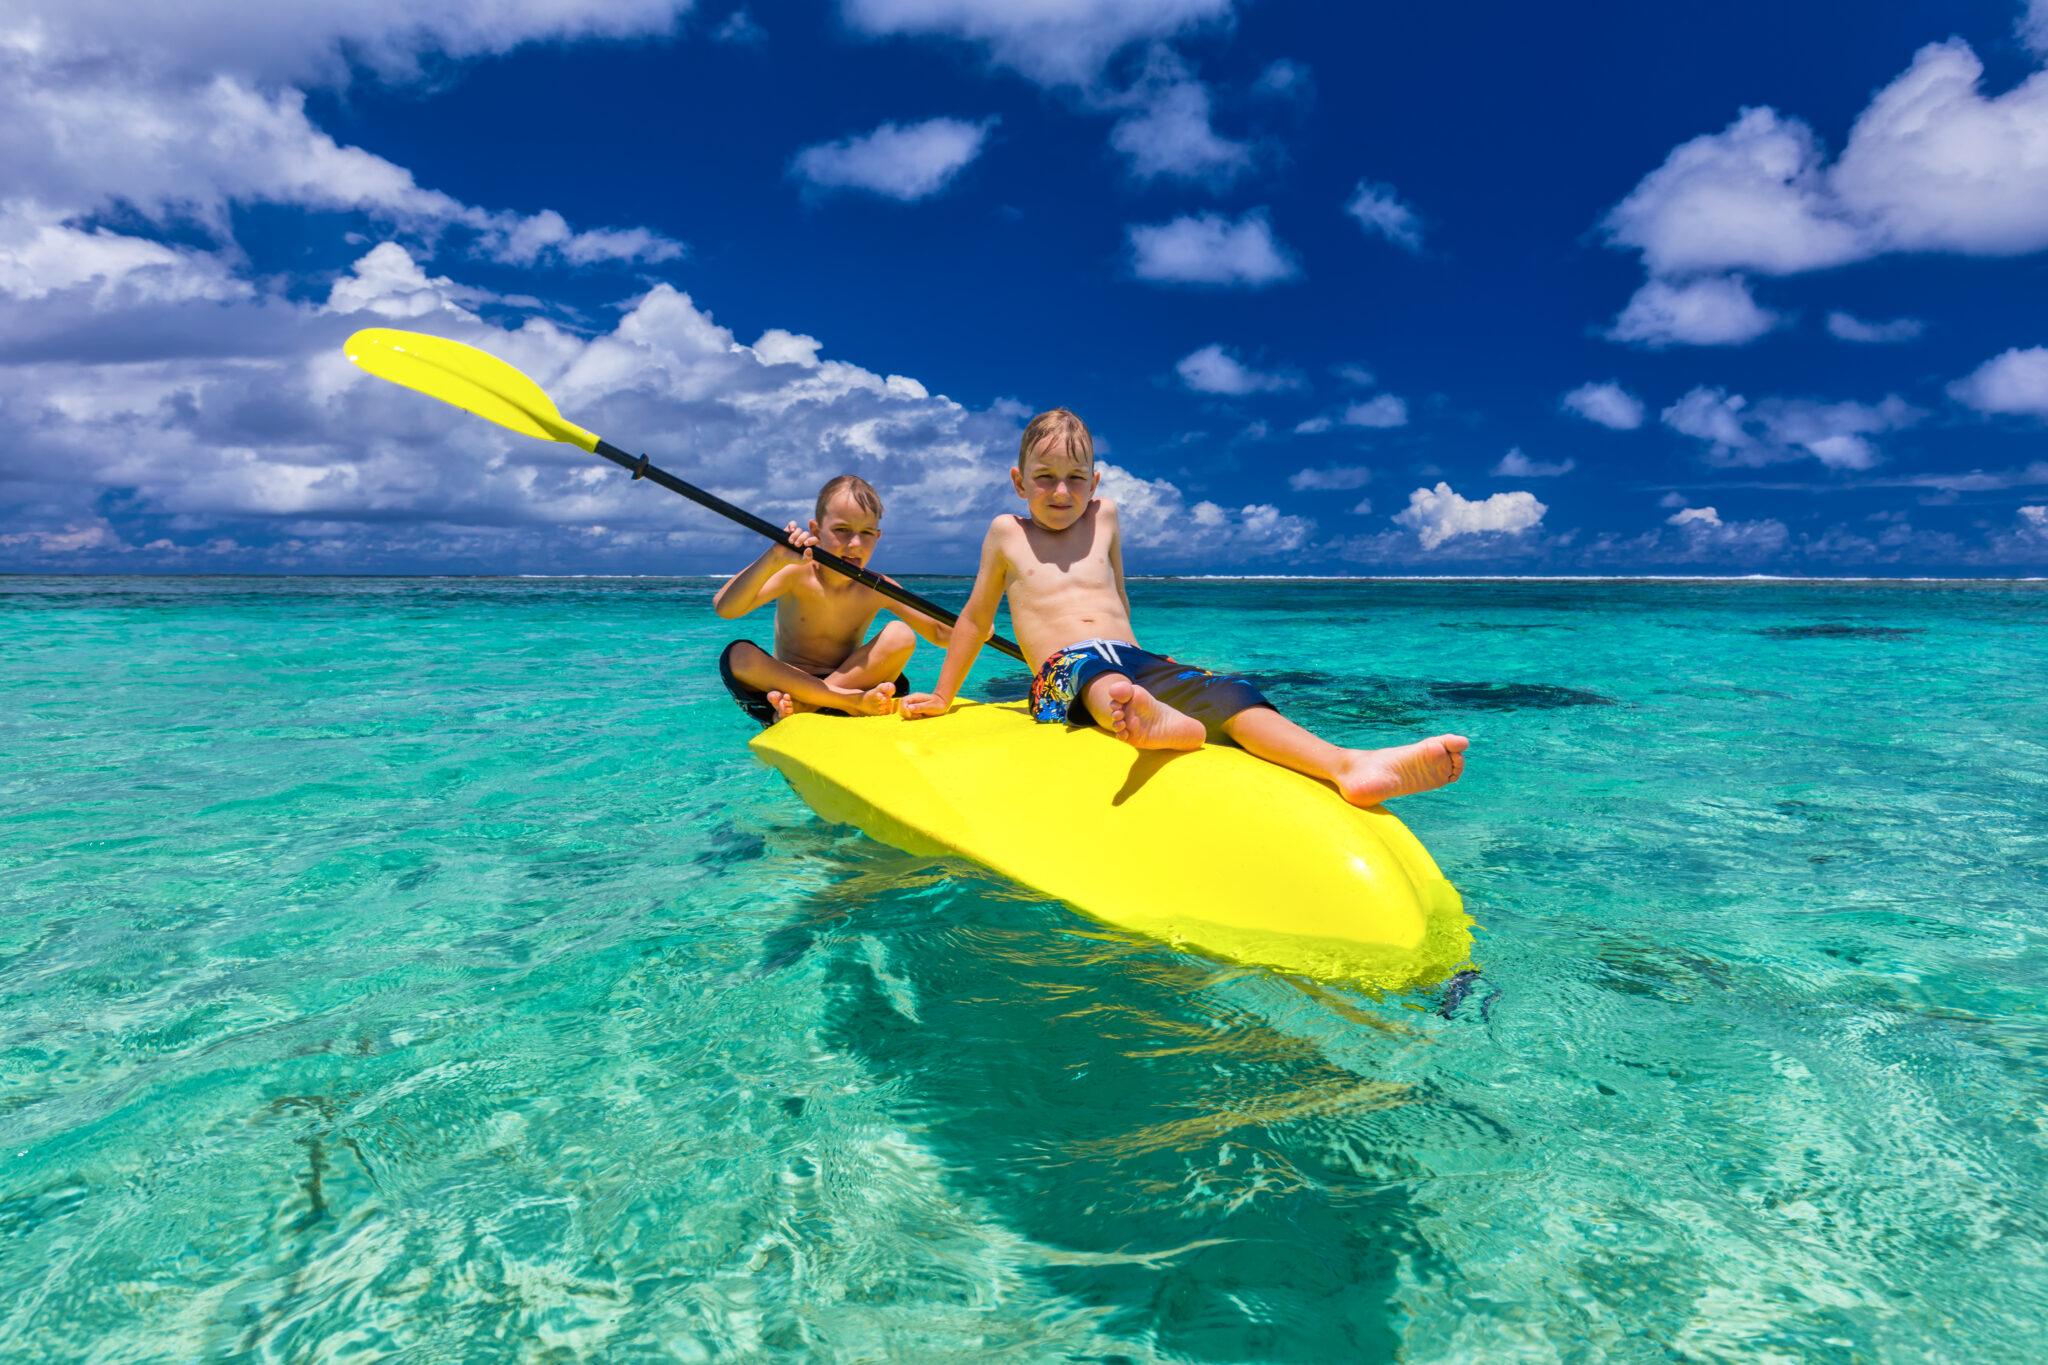 Two young shirtless caucasian boys kayaking at tropical sea on yellow kayak